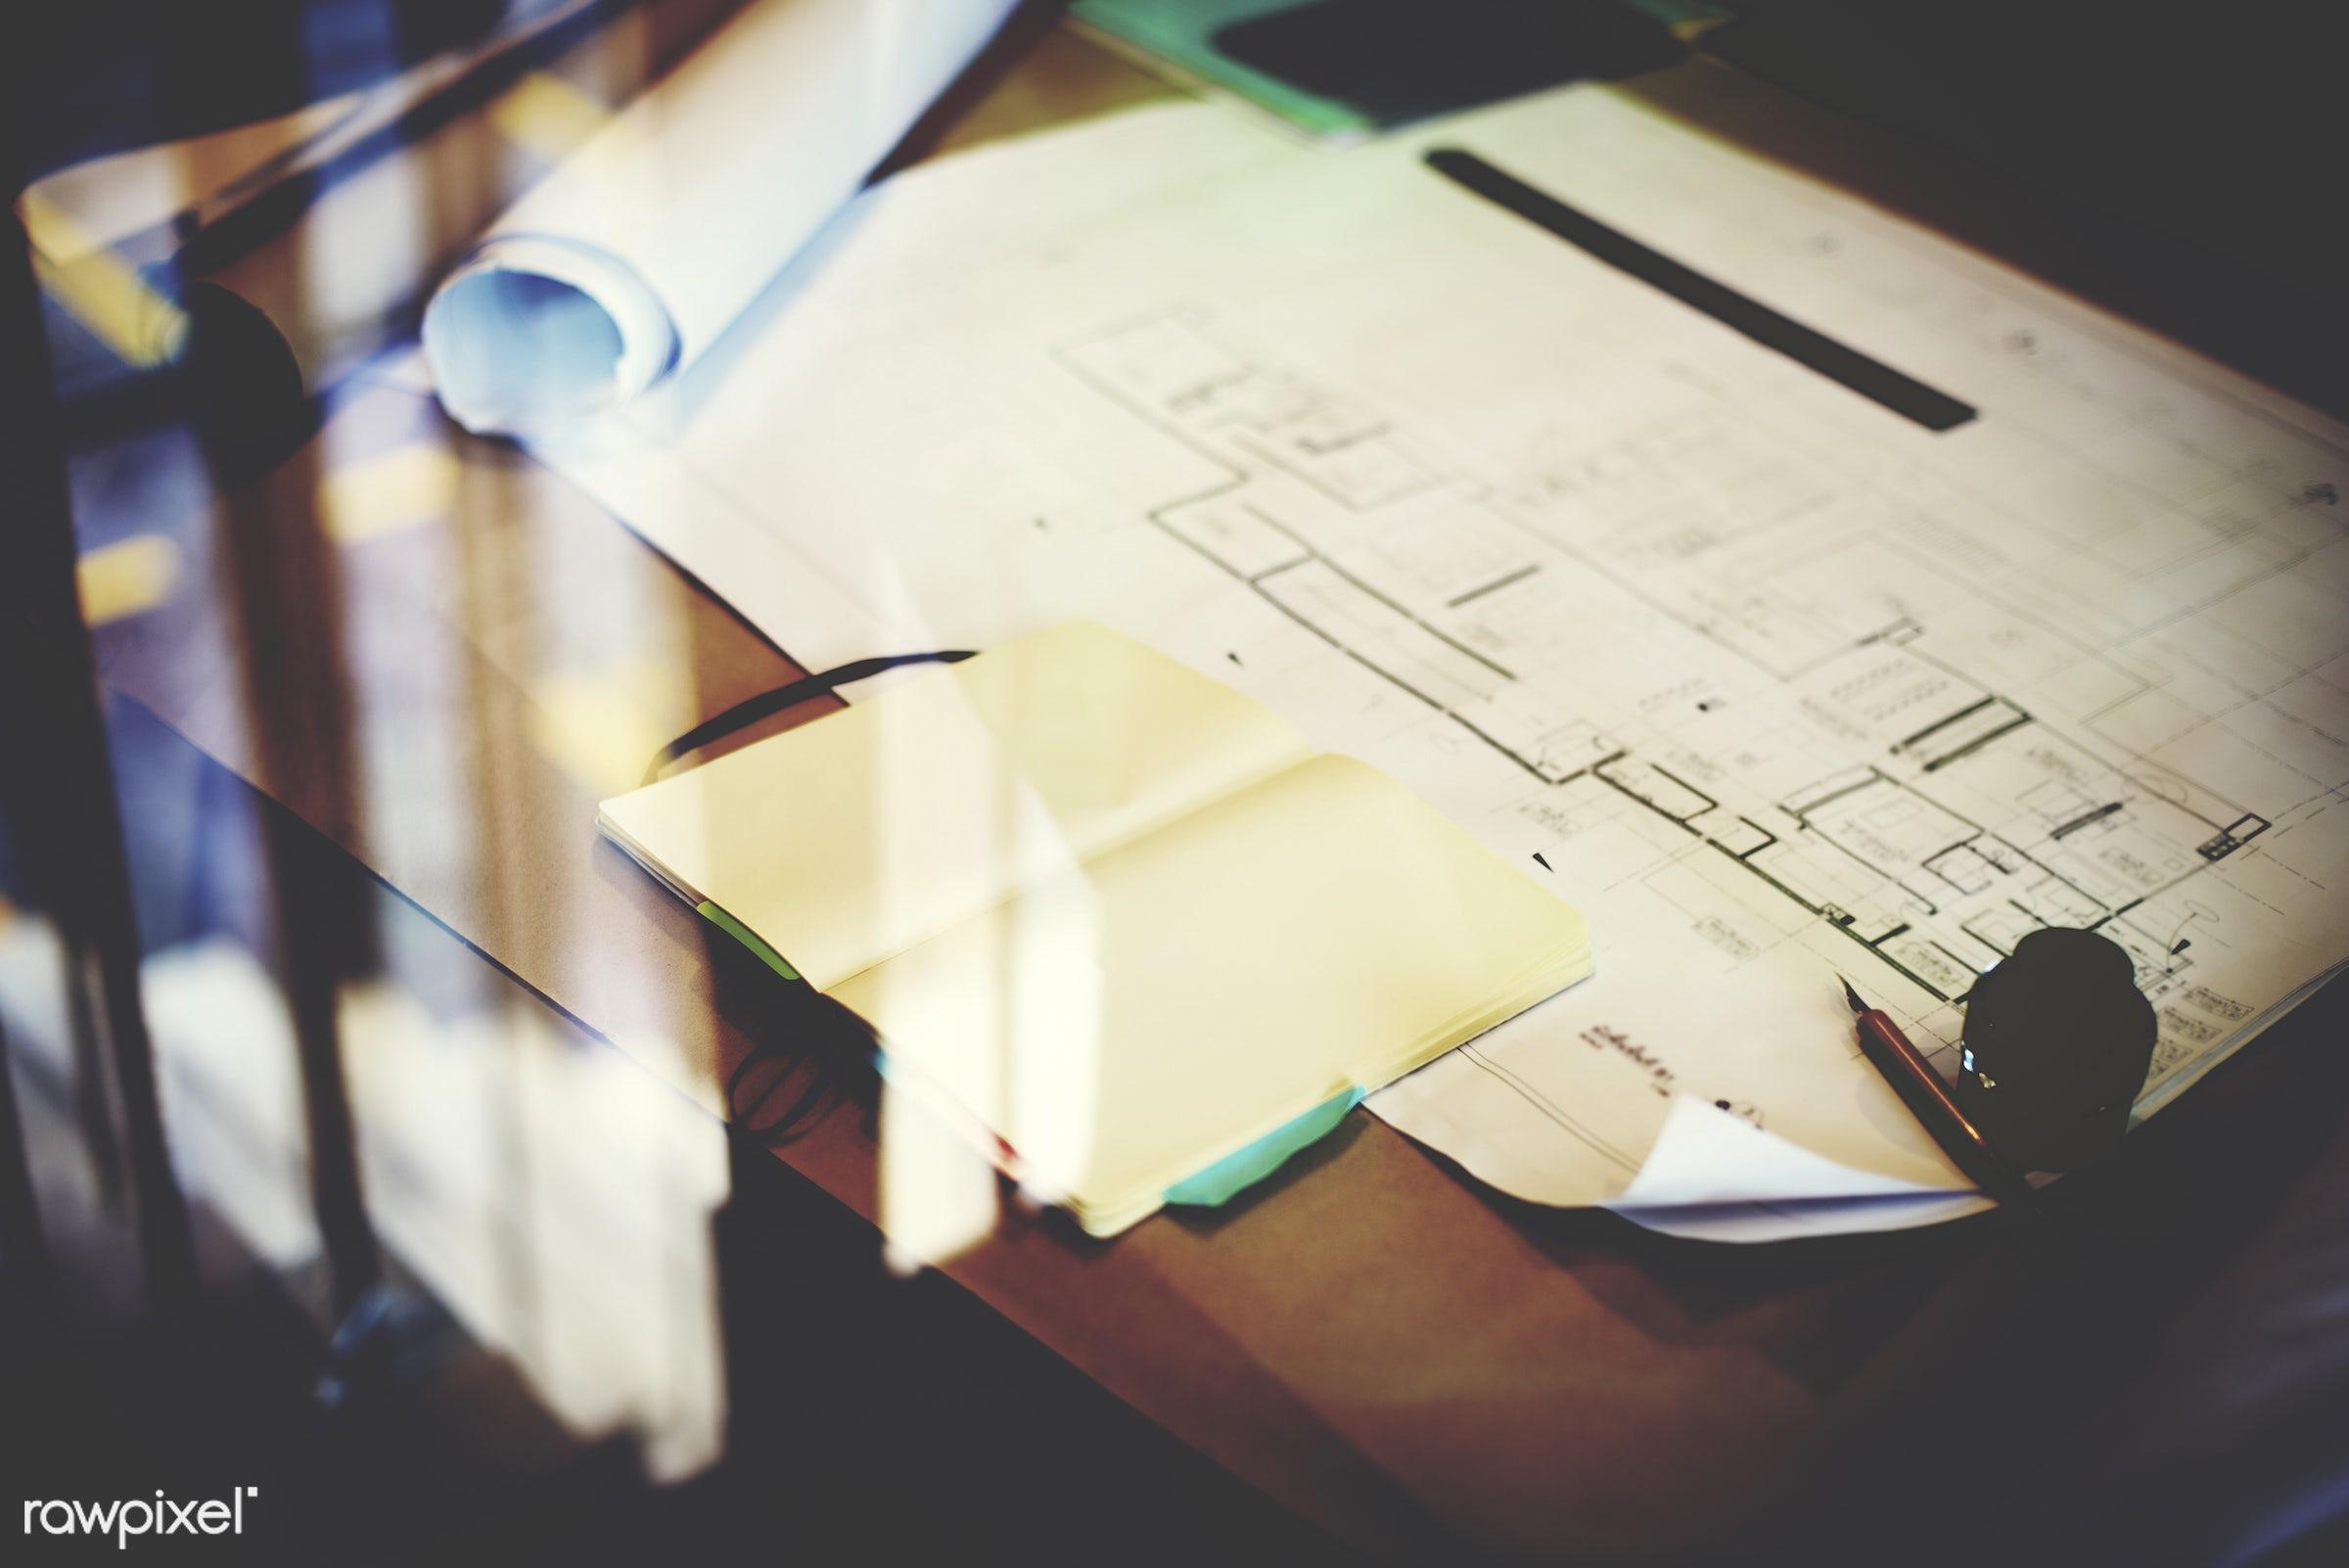 architect, architectural, architecture, blueprint, build, business, calculation, concept, construction, creative, creativity...